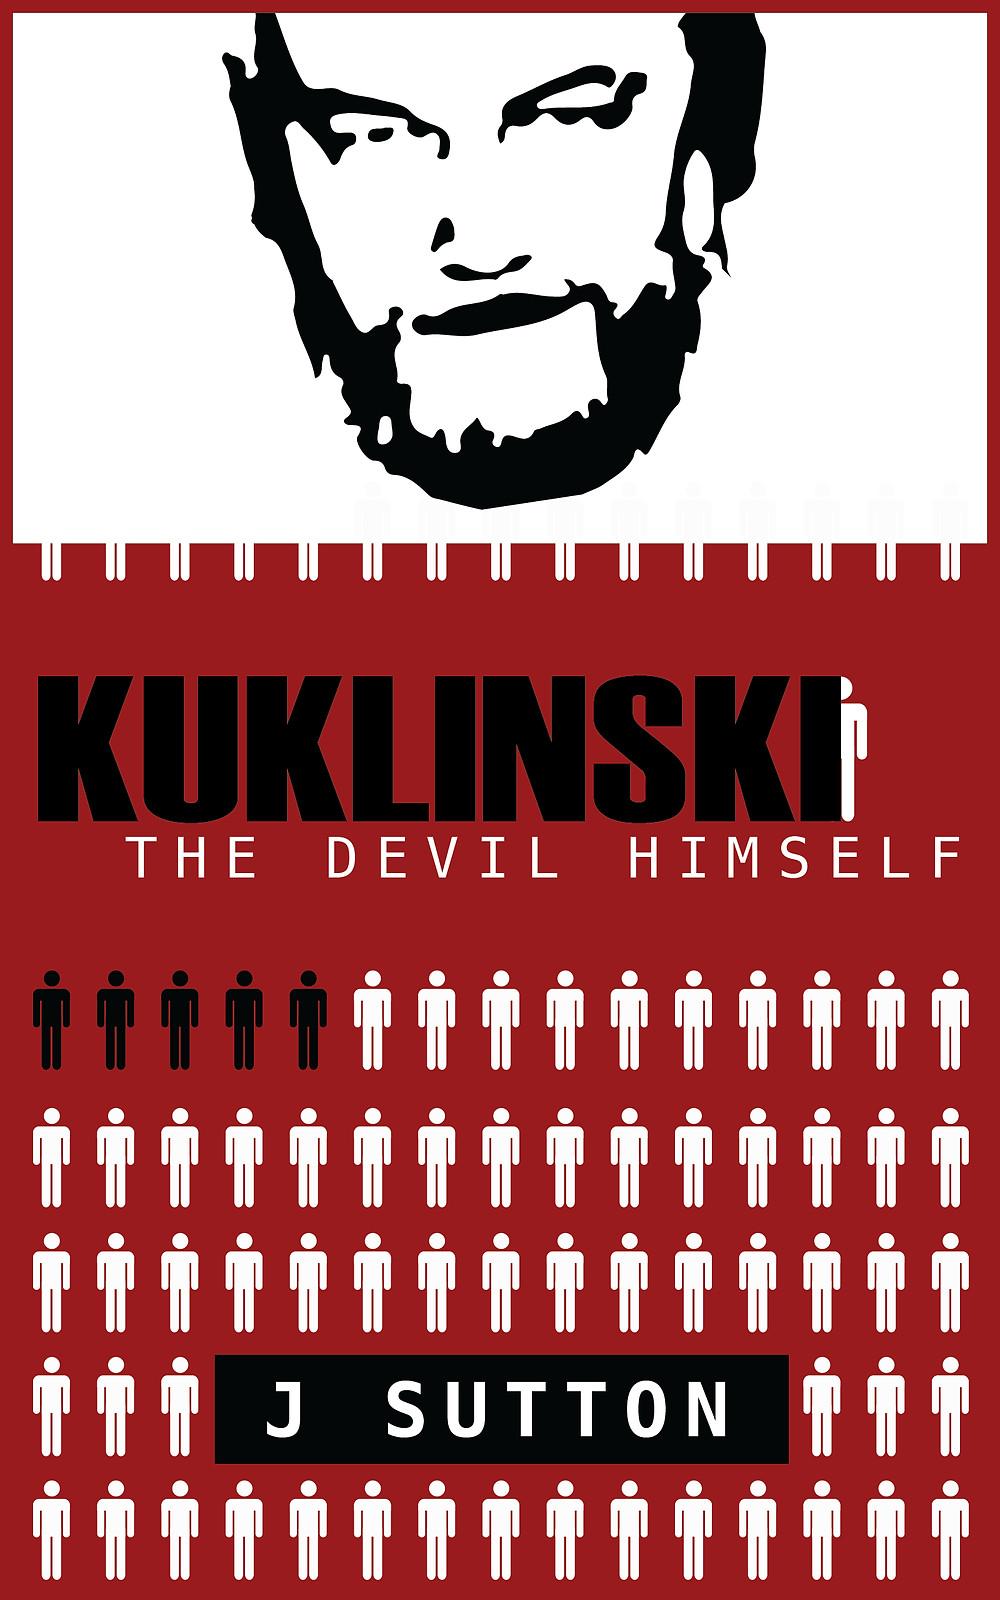 Kuklinski: The Devil Himself